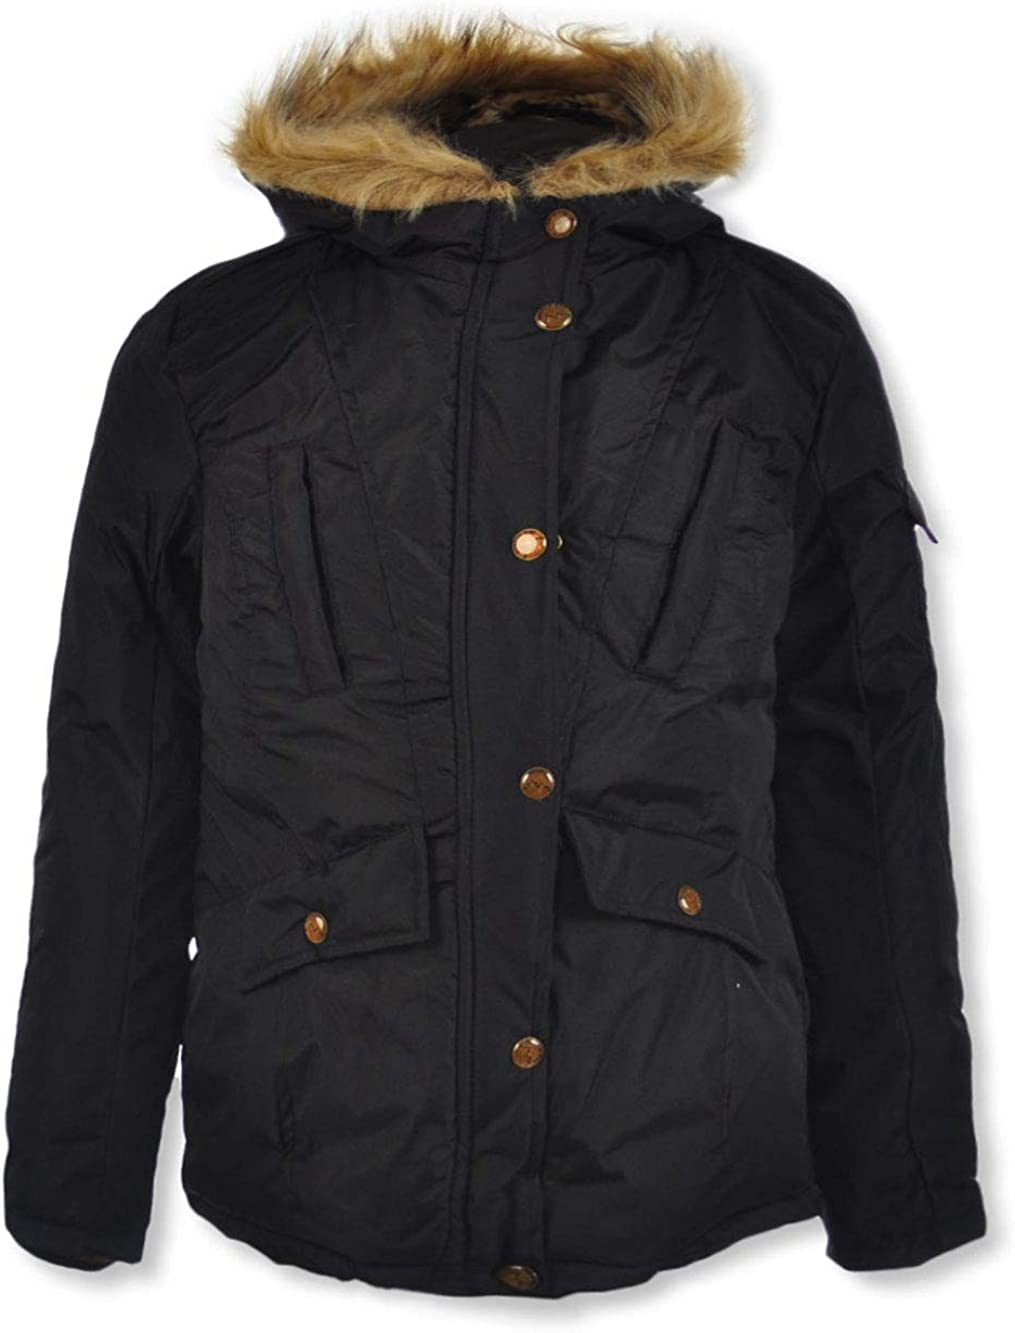 London Fog Big Girls Leopard Hood Insulated Parka - black, 7-8